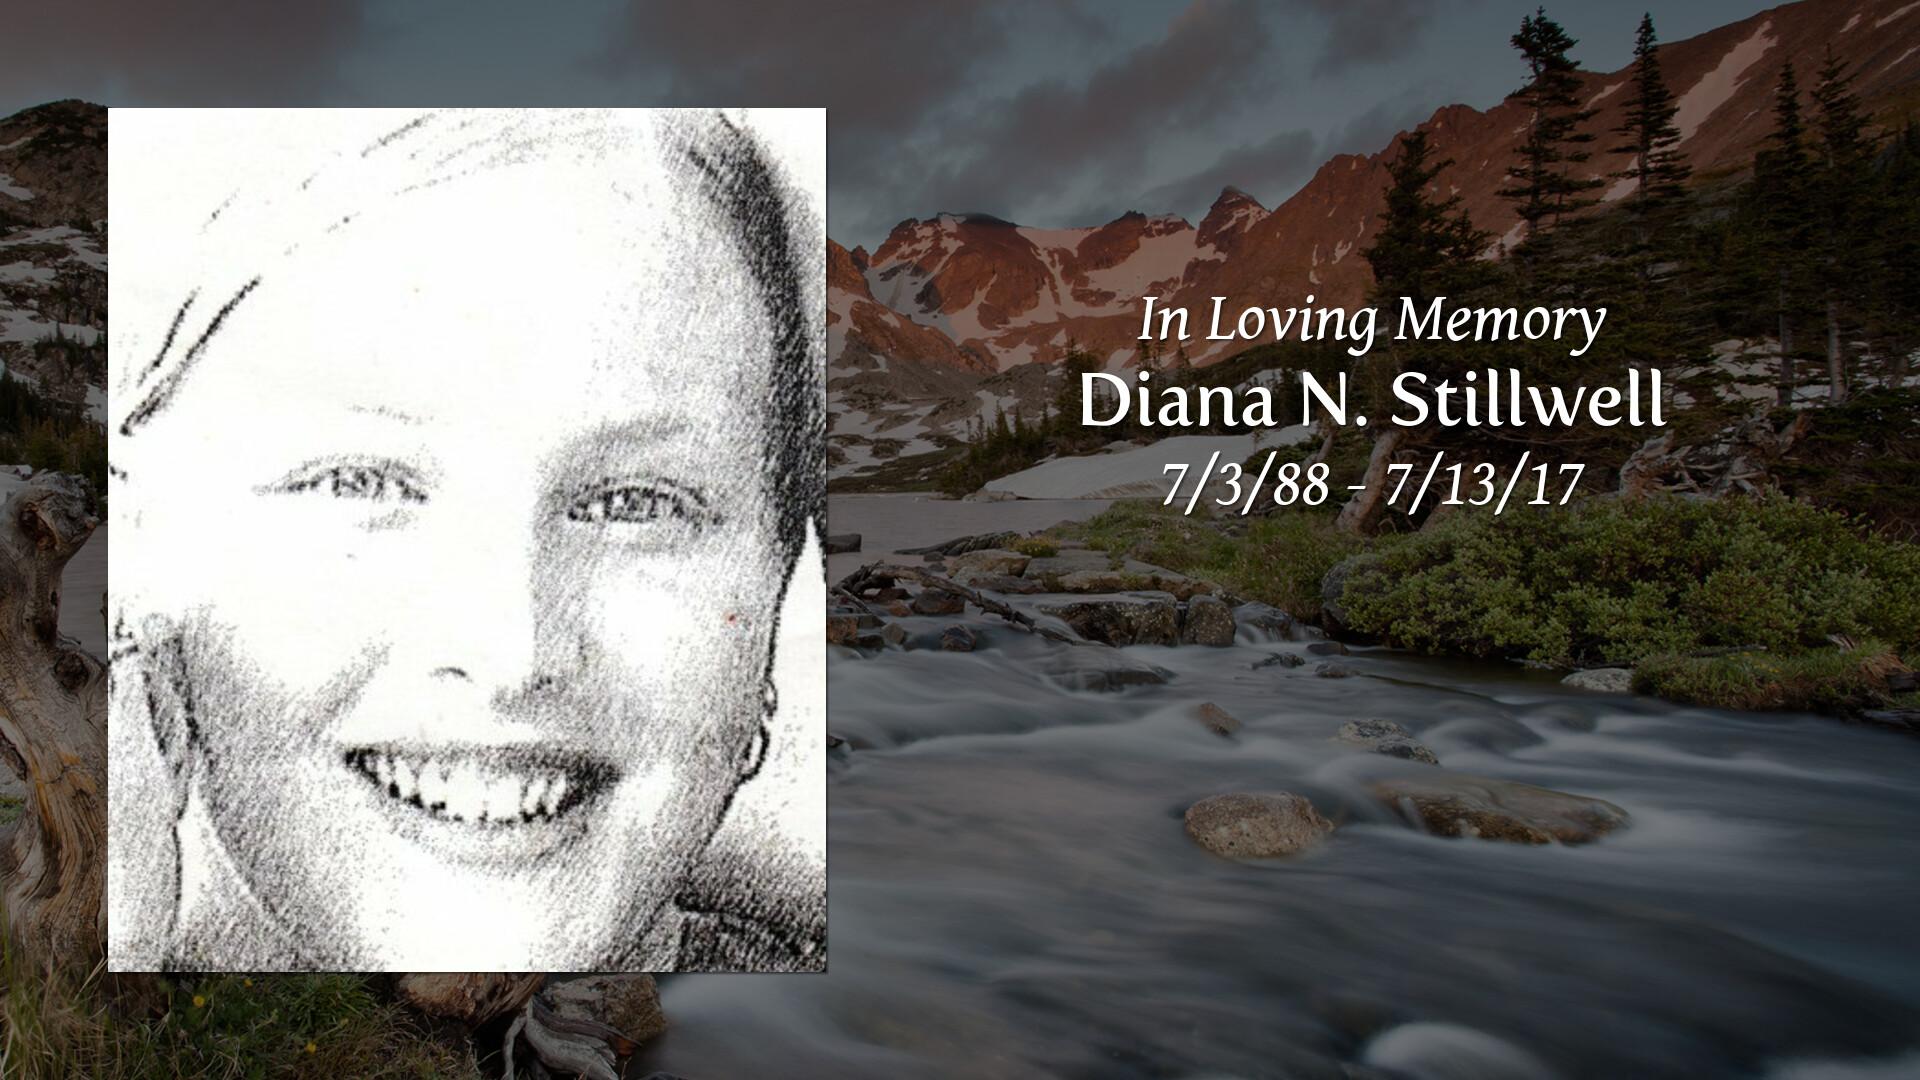 Obituary | Diana N  Stillwell of Browns Mills, New Jersey